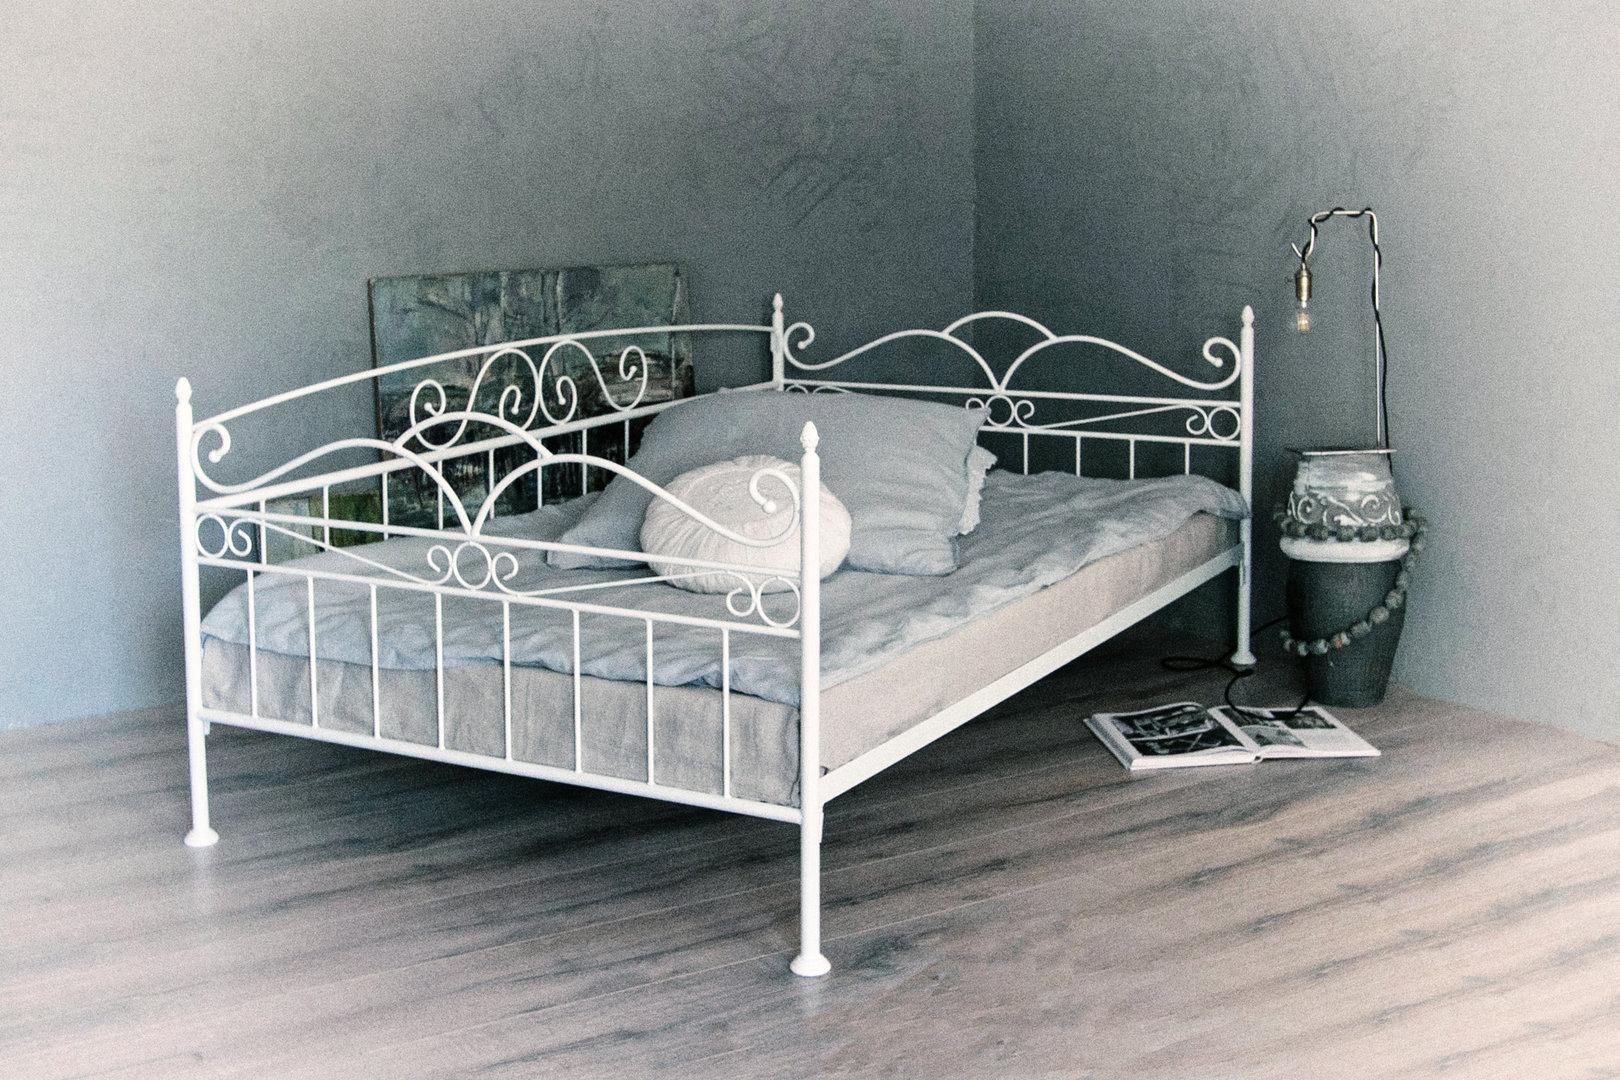 Full Size of 120x200 Bett 180x200 Mit Bettkasten Massiv Bette Starlet Amerikanisches Luxus Betten 2m X 200x200 Lattenrost 160x200 90x190 Jensen Beleuchtung Weiß Aus Bett 120x200 Bett